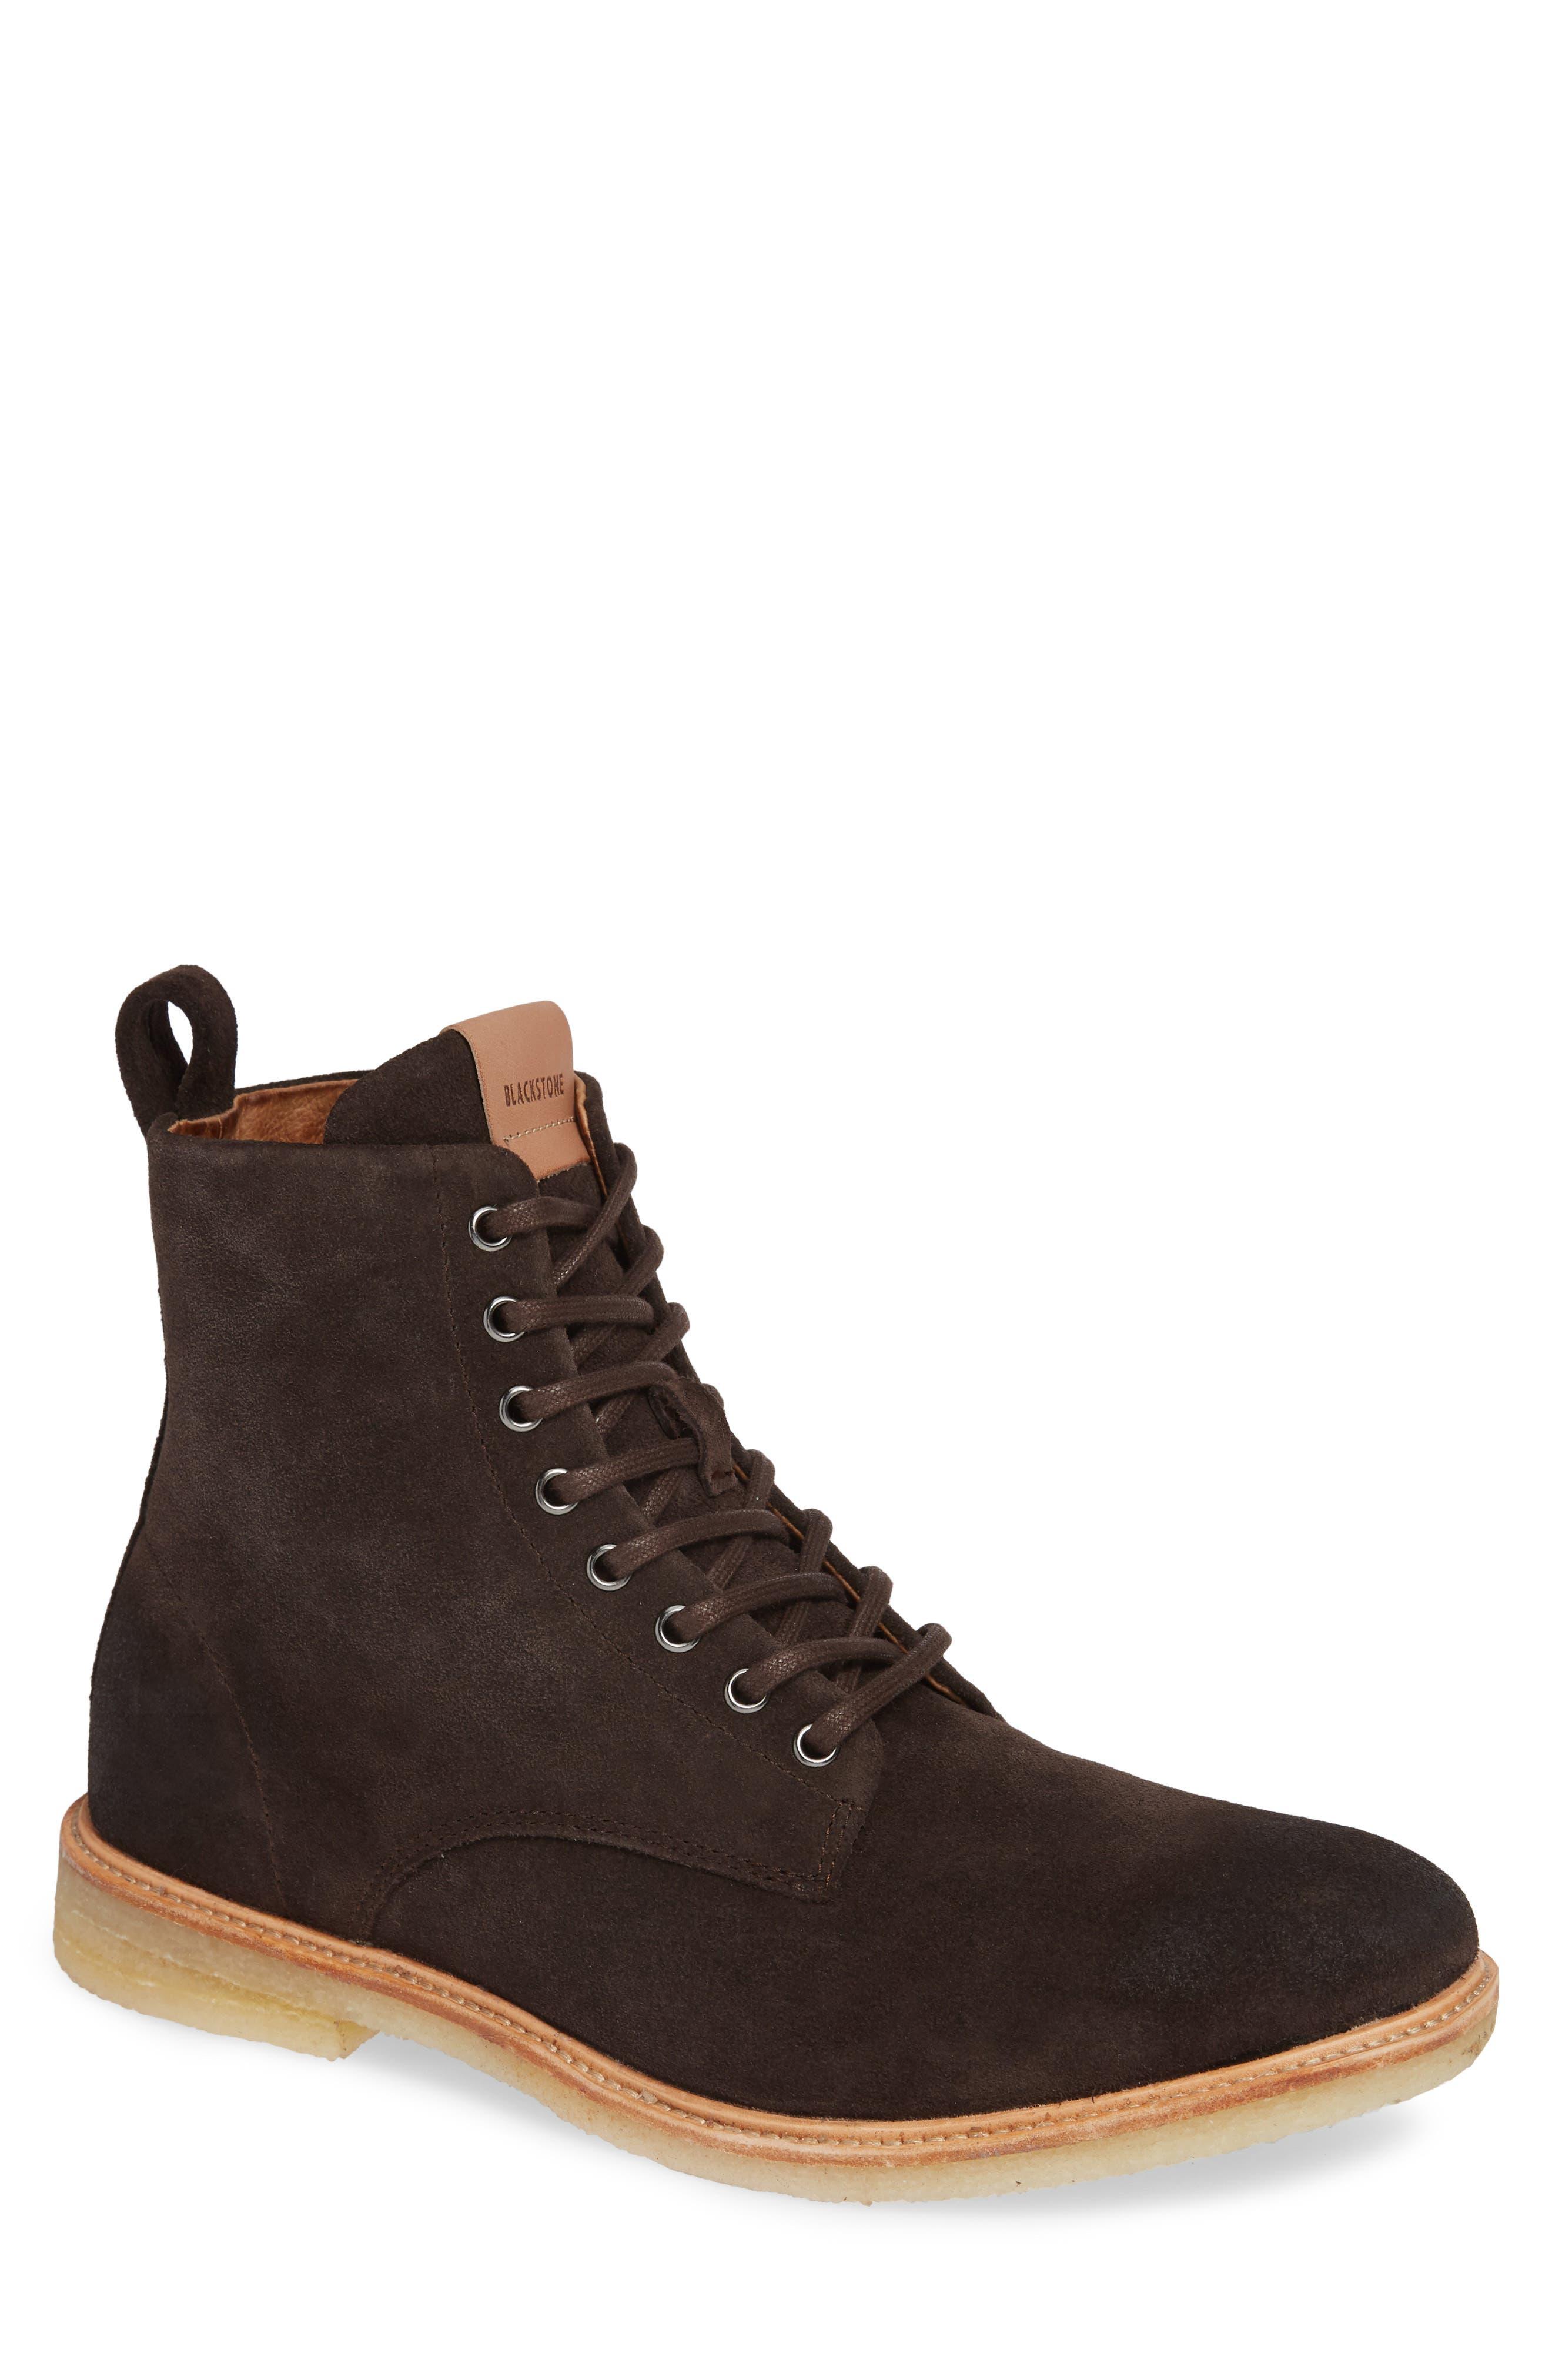 Blackstone Qm23 Plain Toe Boot - Brown